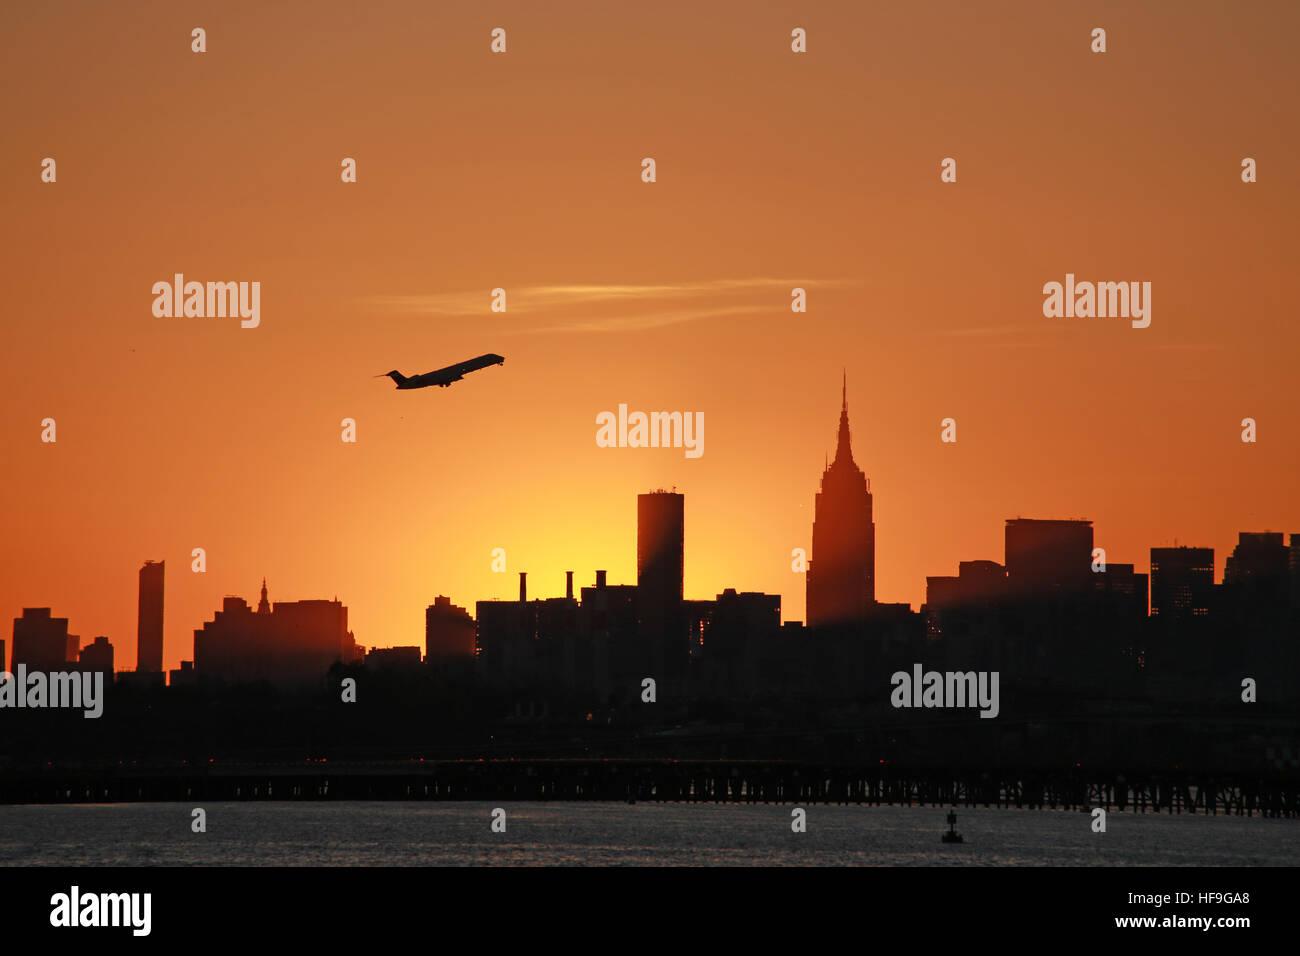 Silhouette of jet taking off over Manhattan skyline, New York, NY, USA Stock Photo